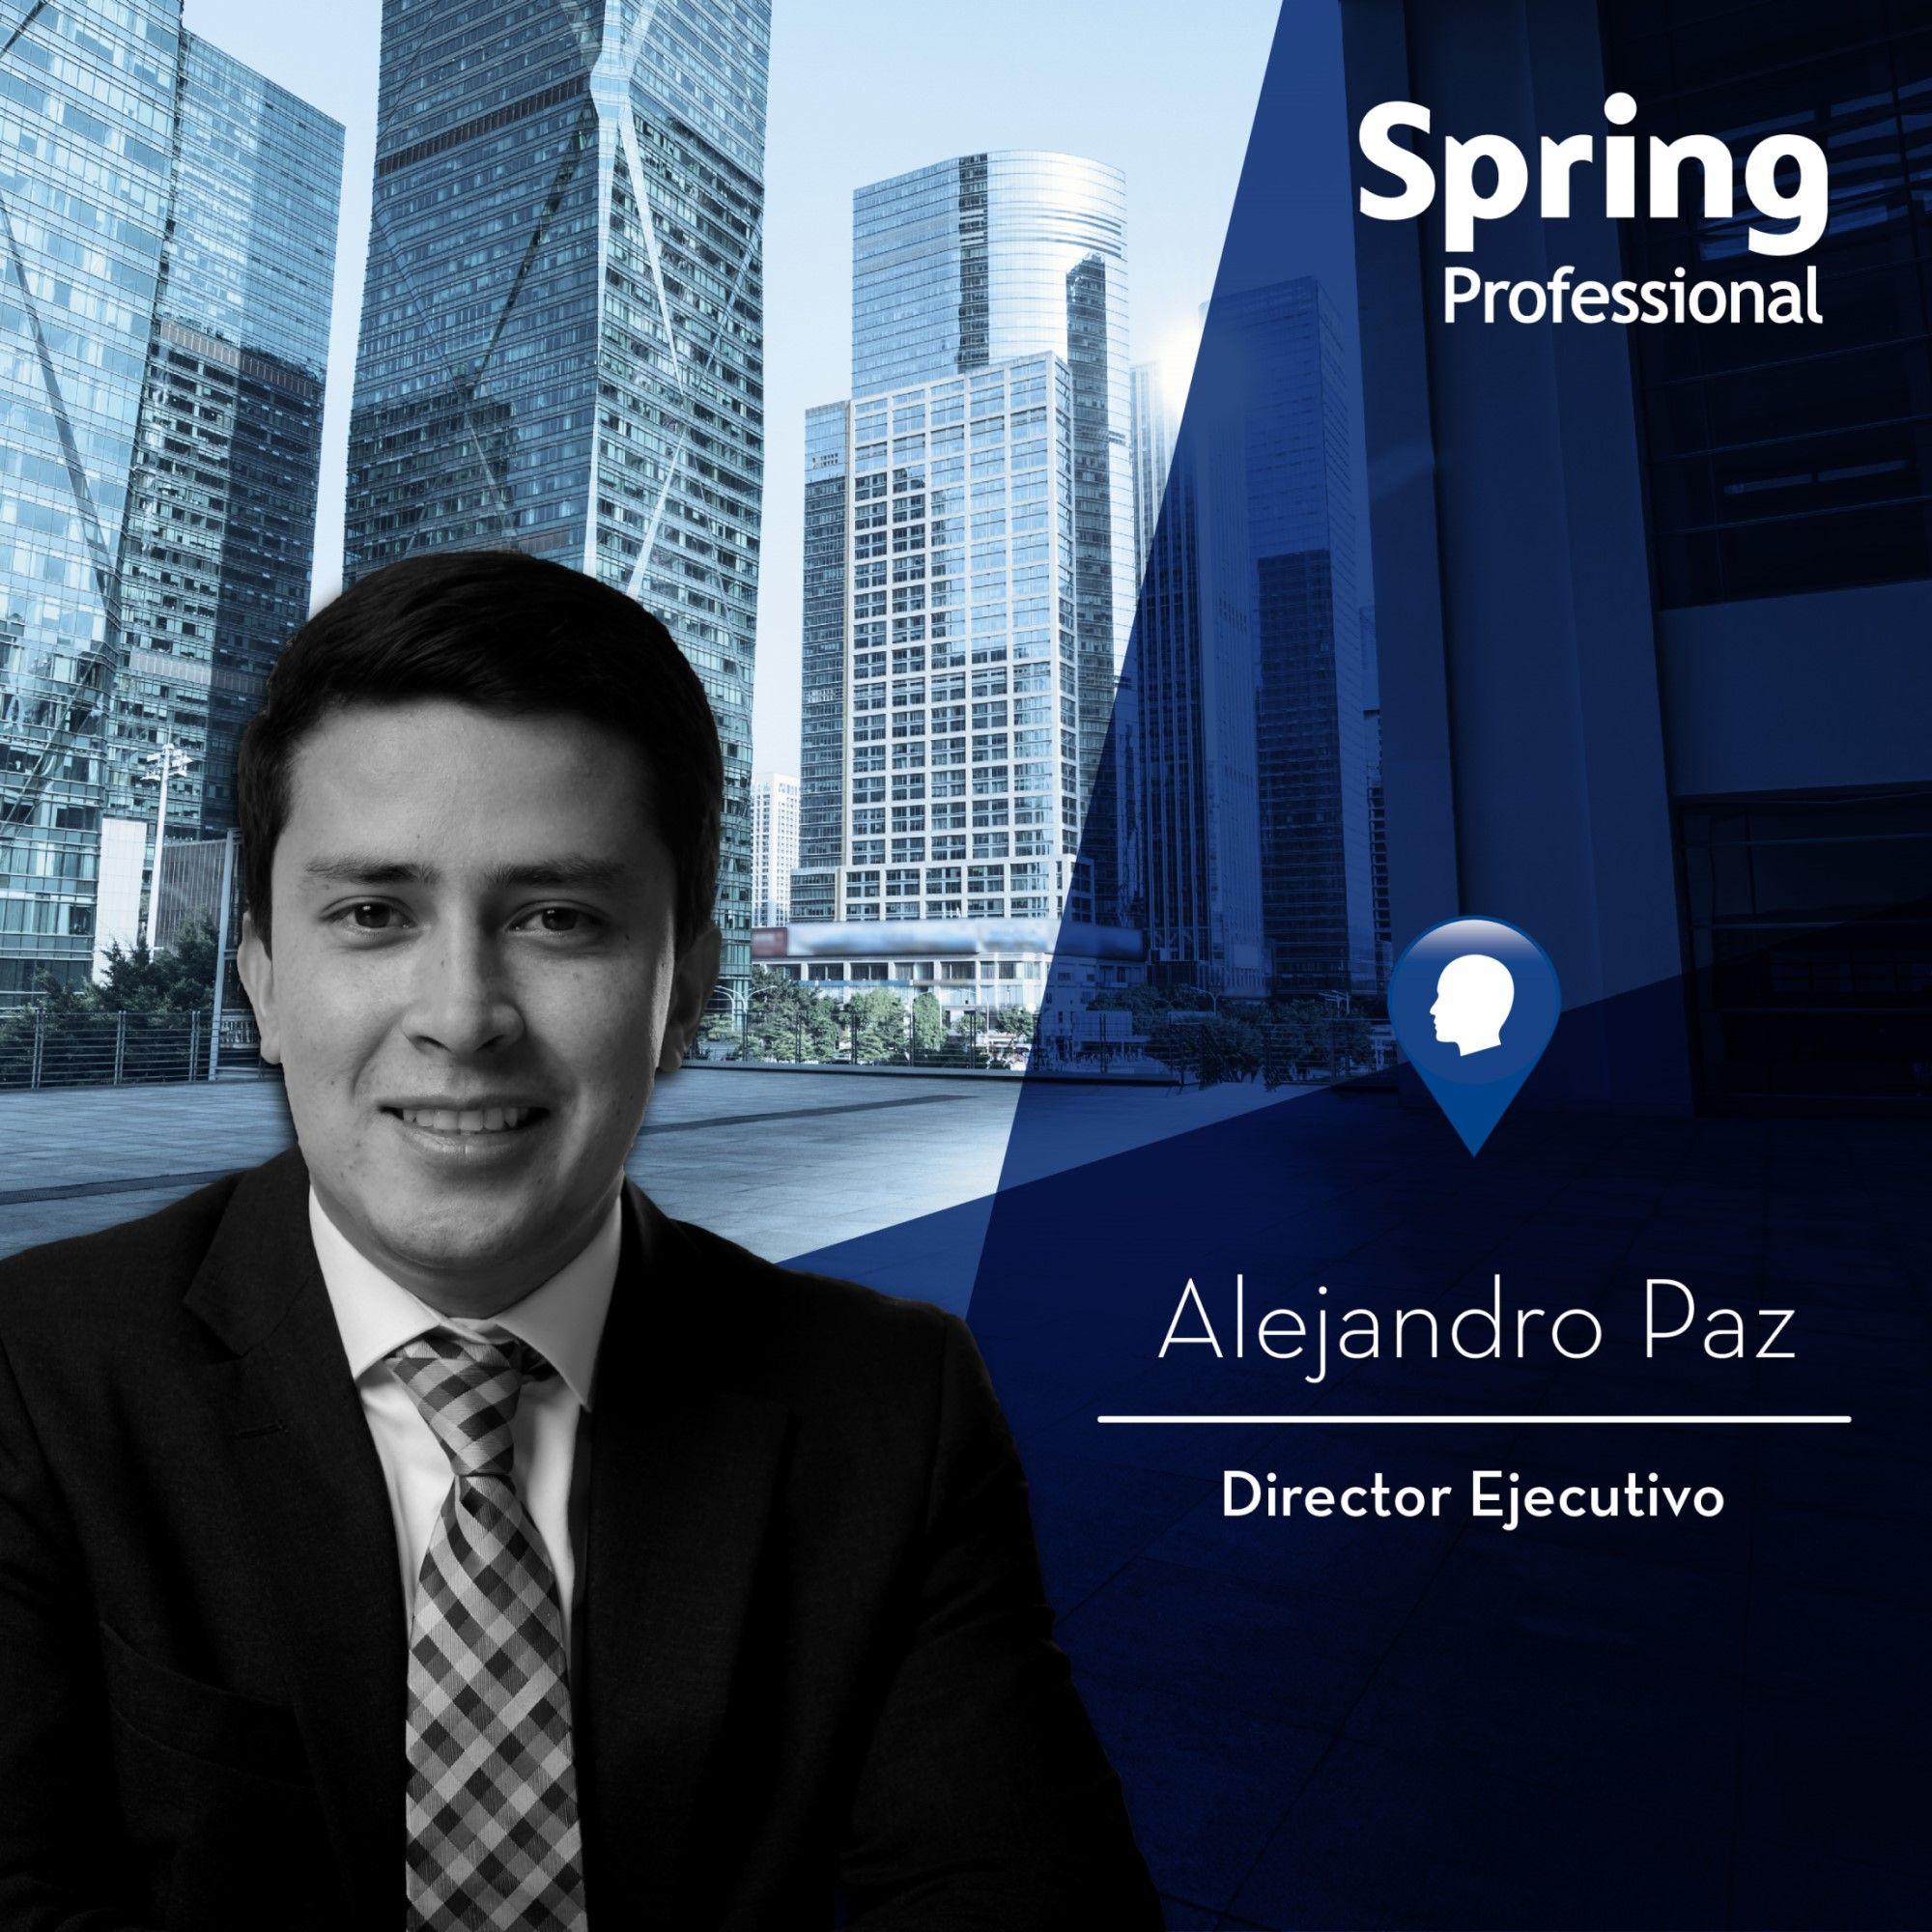 Fotografia Alejandro Paz, Director Ejecutivo. Spring Professional